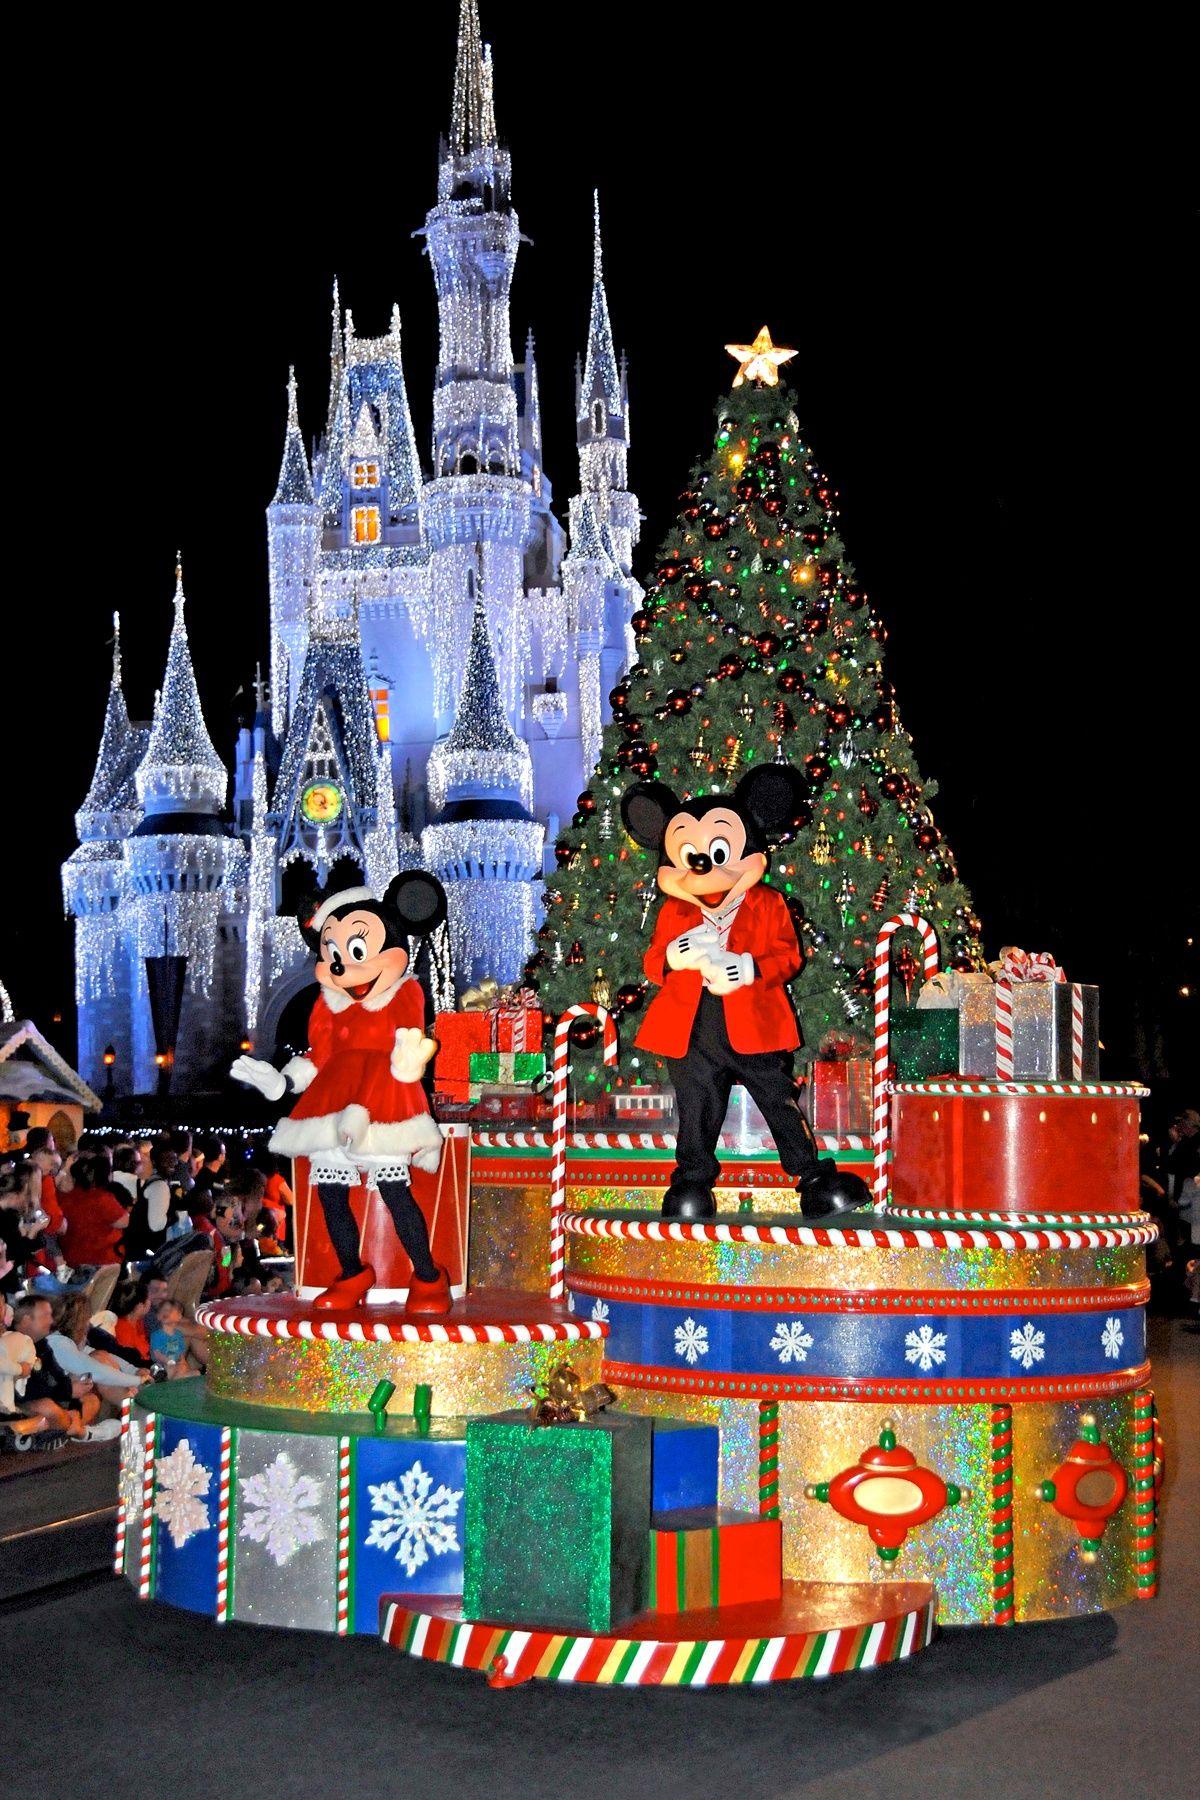 disney world at christmas time disney very merry christmas disney world christmas disneyland - Christmas Disney World